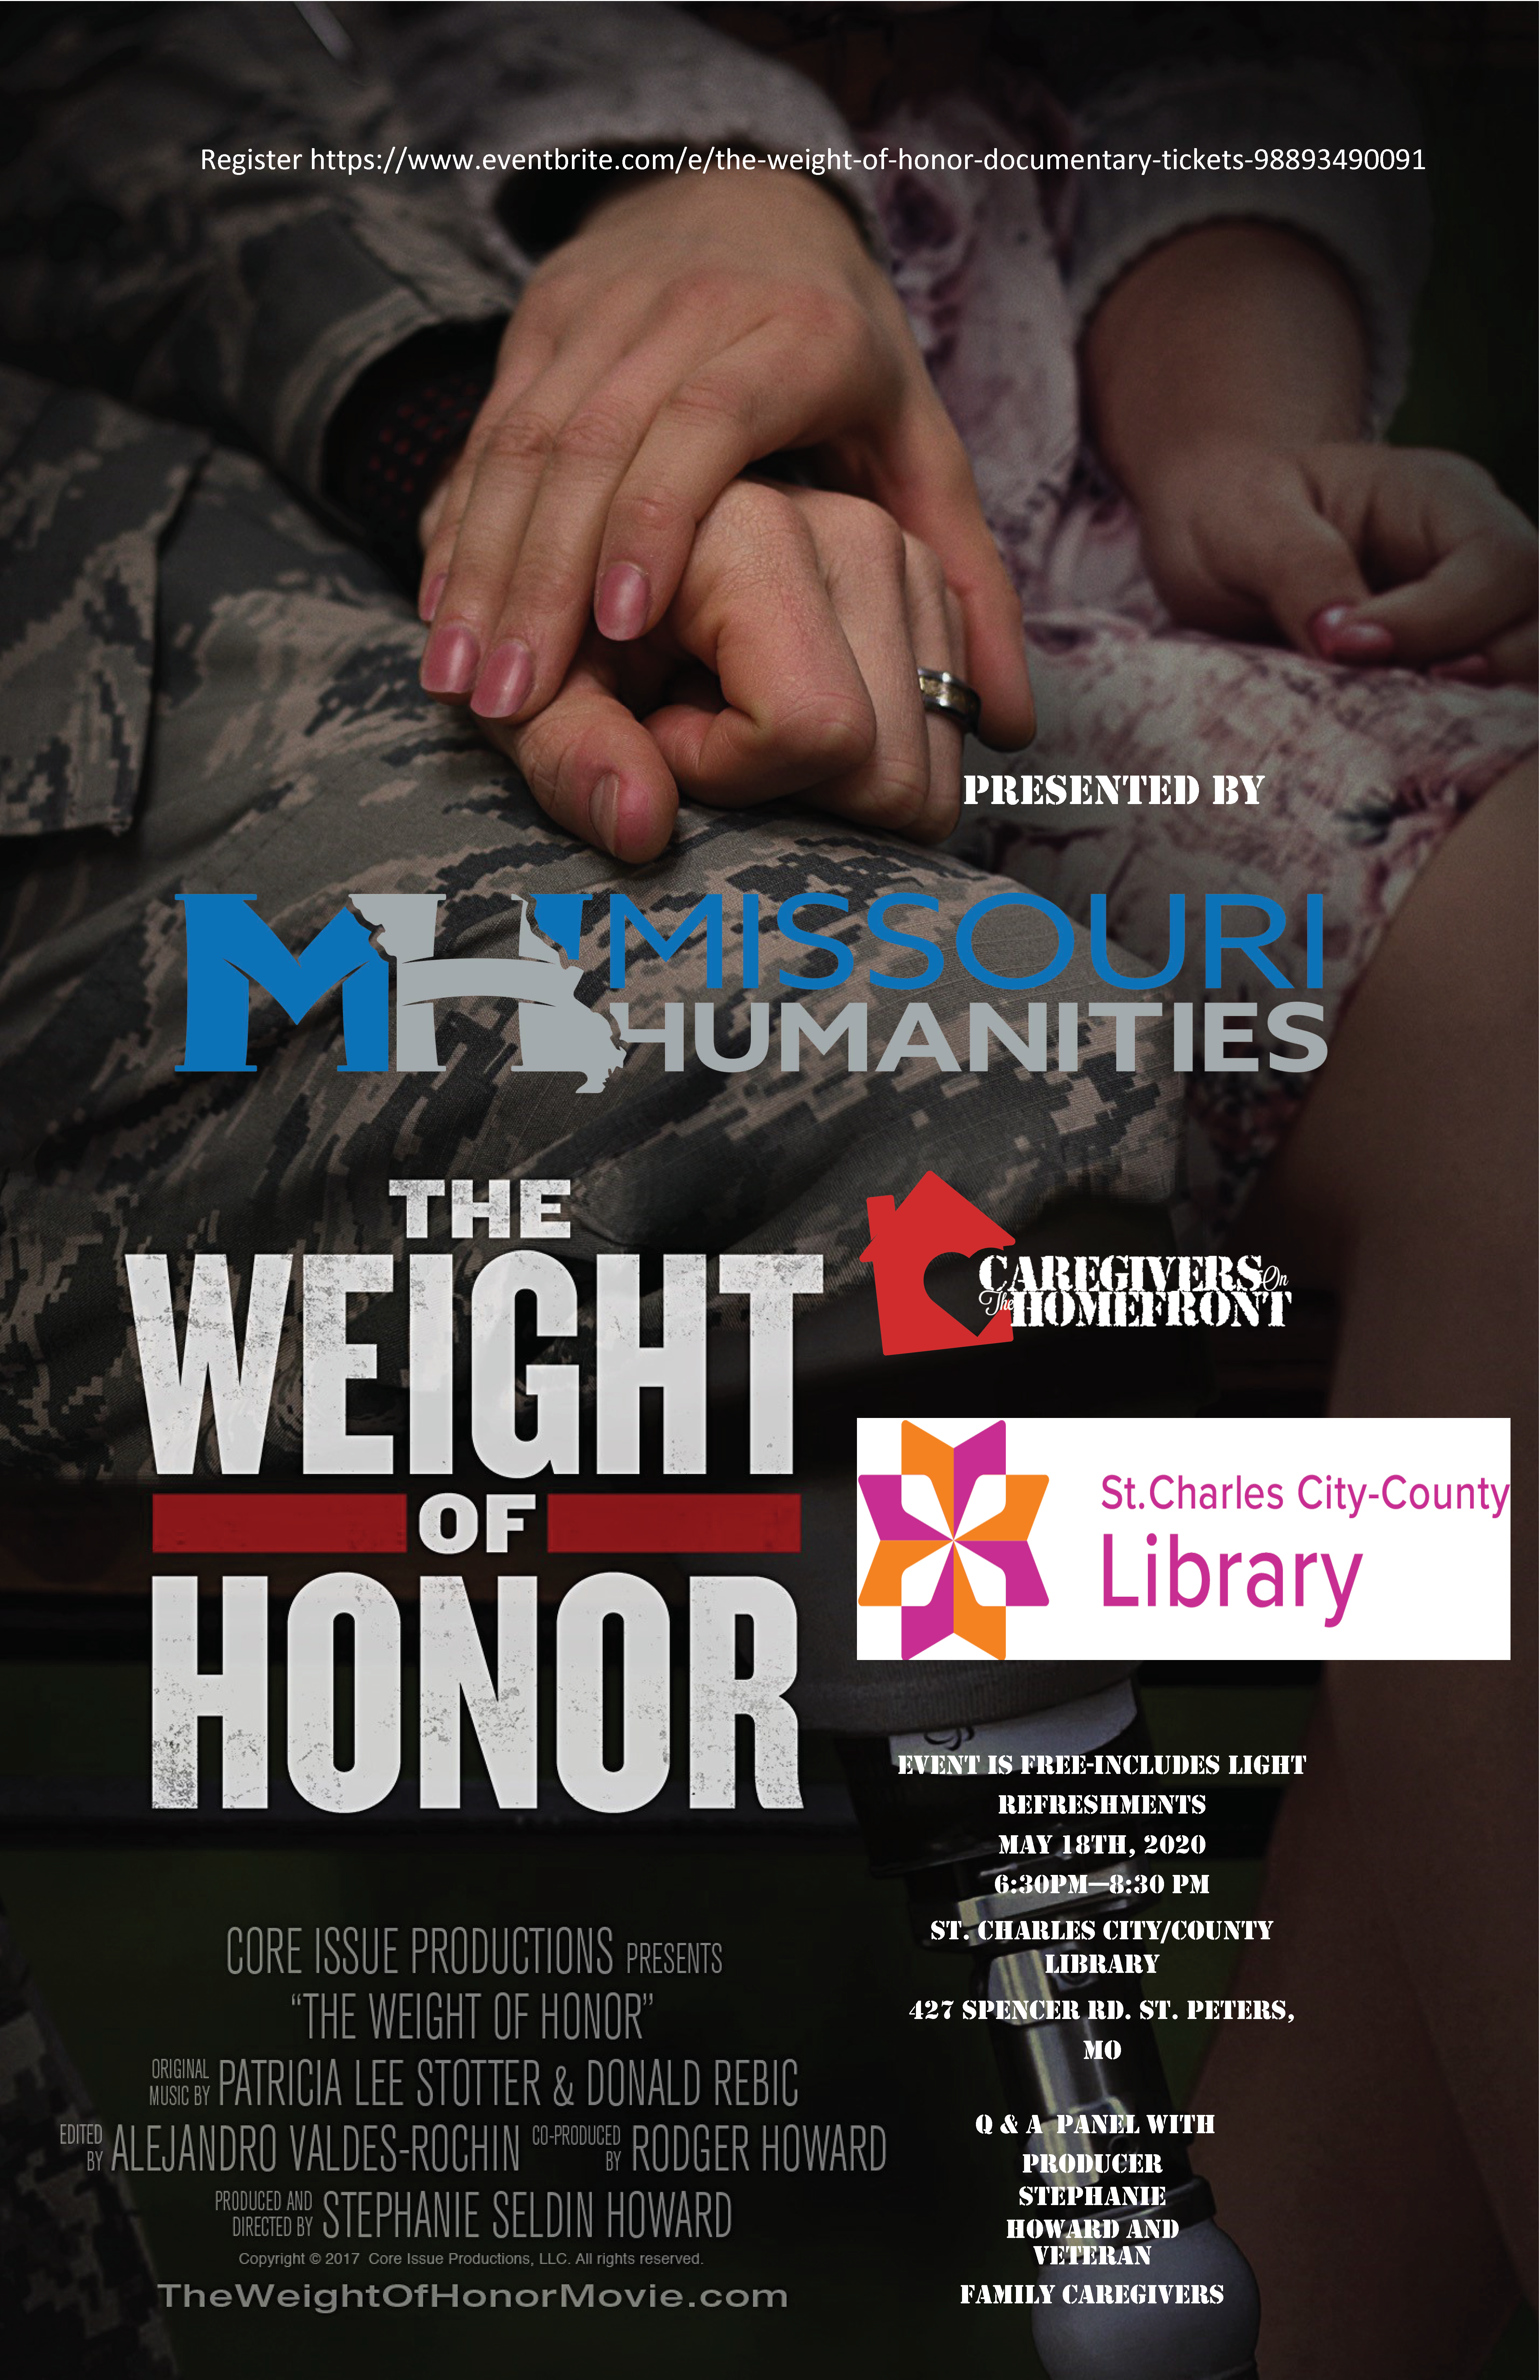 Weight of Honor Film Screening